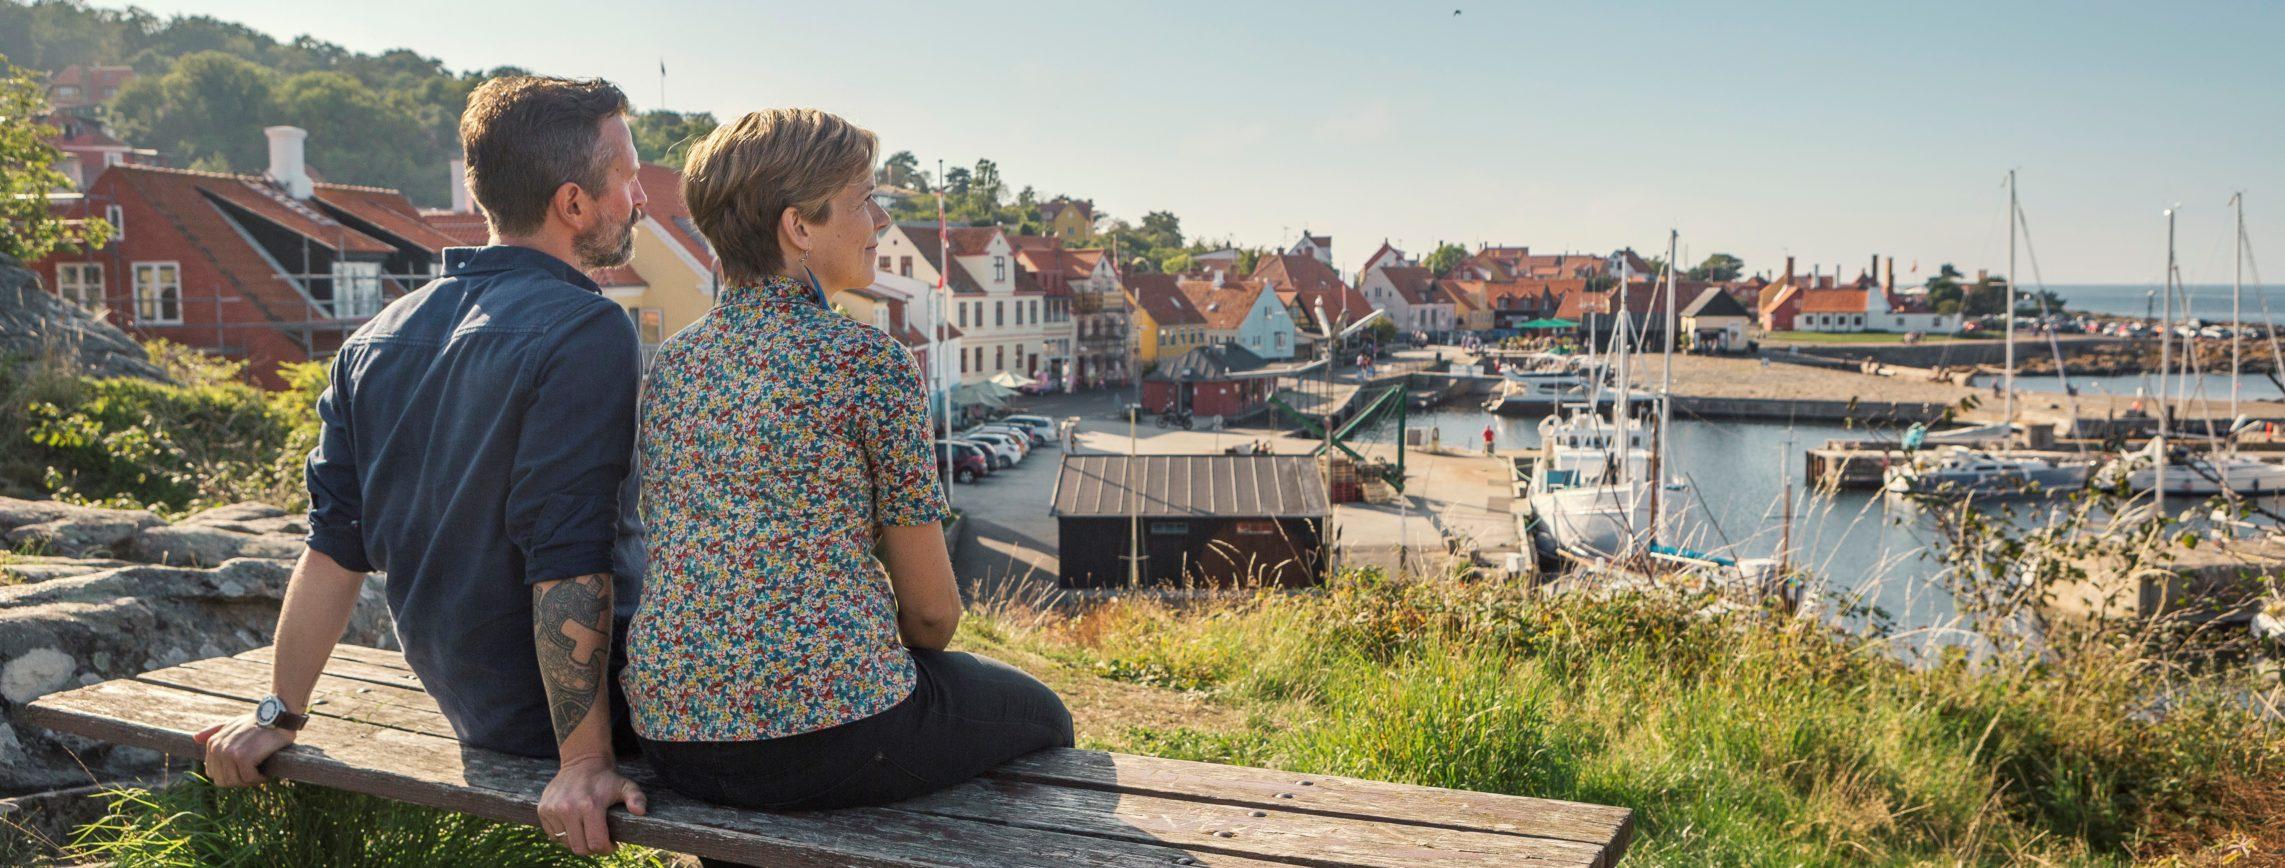 Parferie på Bornholm